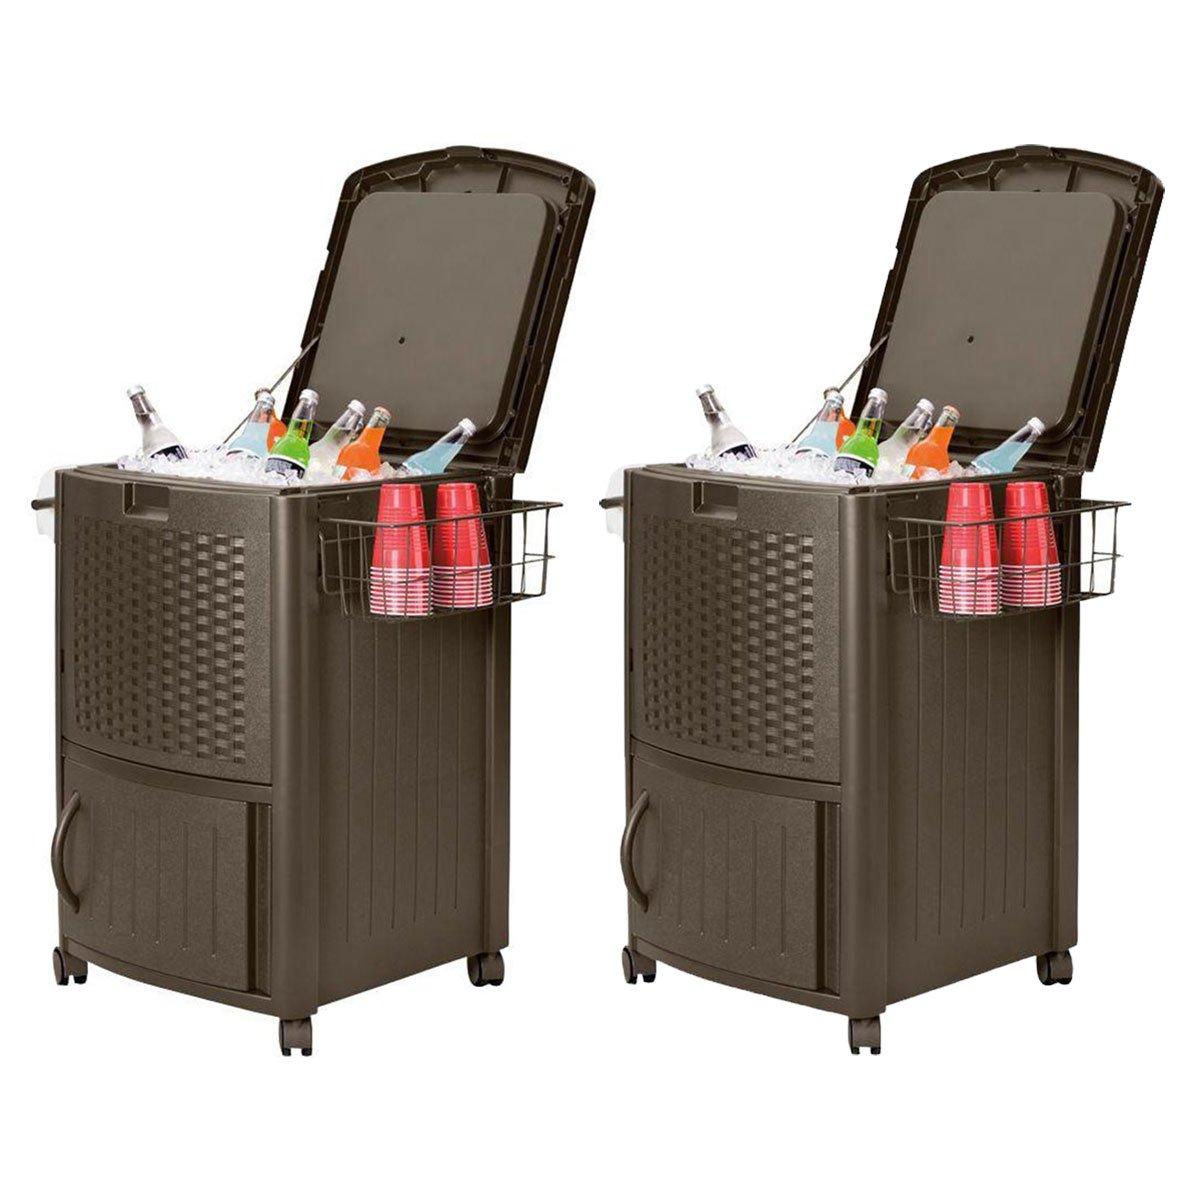 Suncast 77 Qt Resin Wicker Patio Cooler w/ Cabinet & Wire Basket, Java (2 Pack)